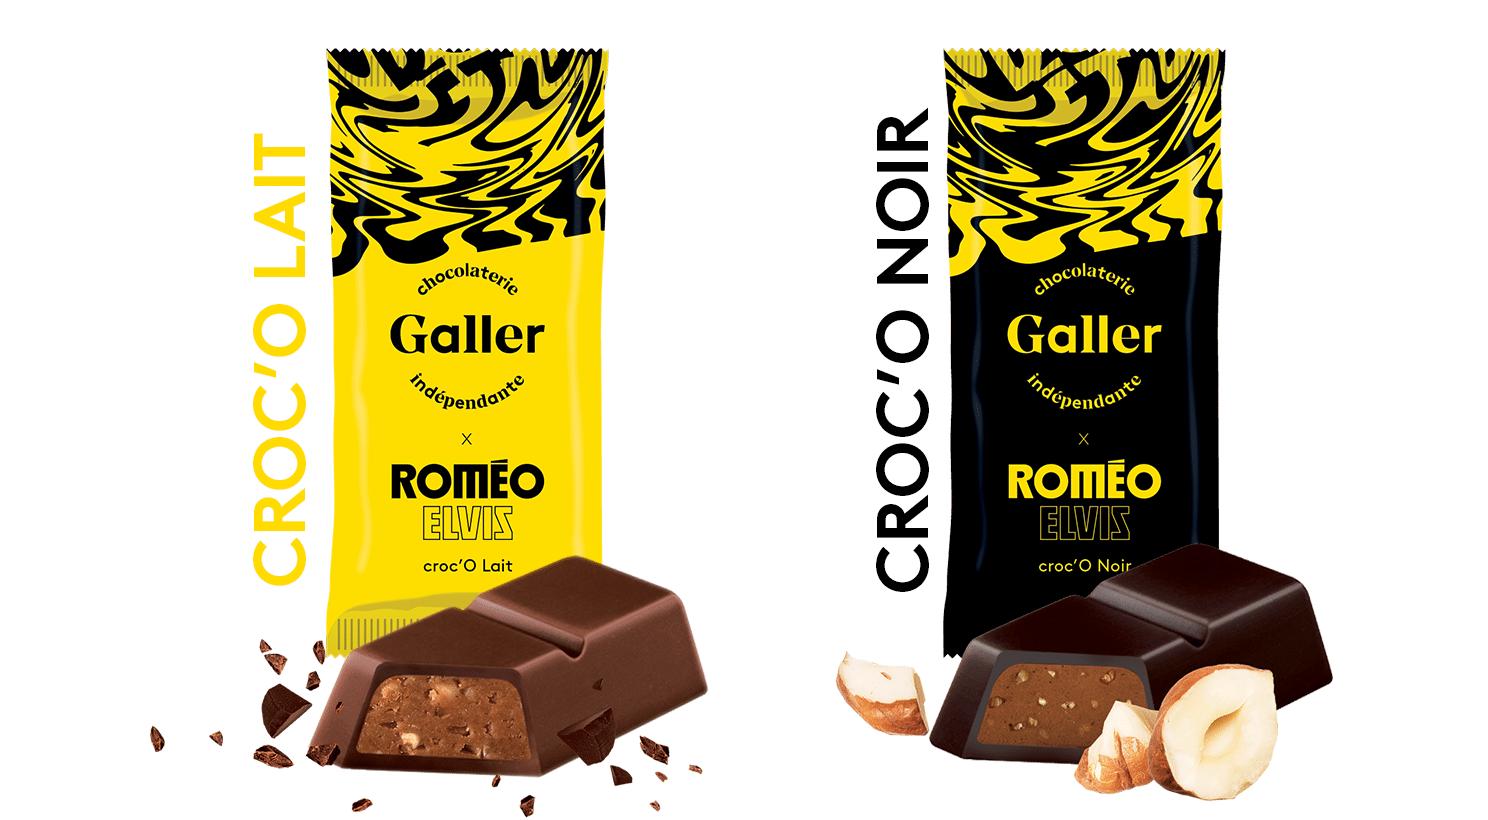 roméo elvis chocolat